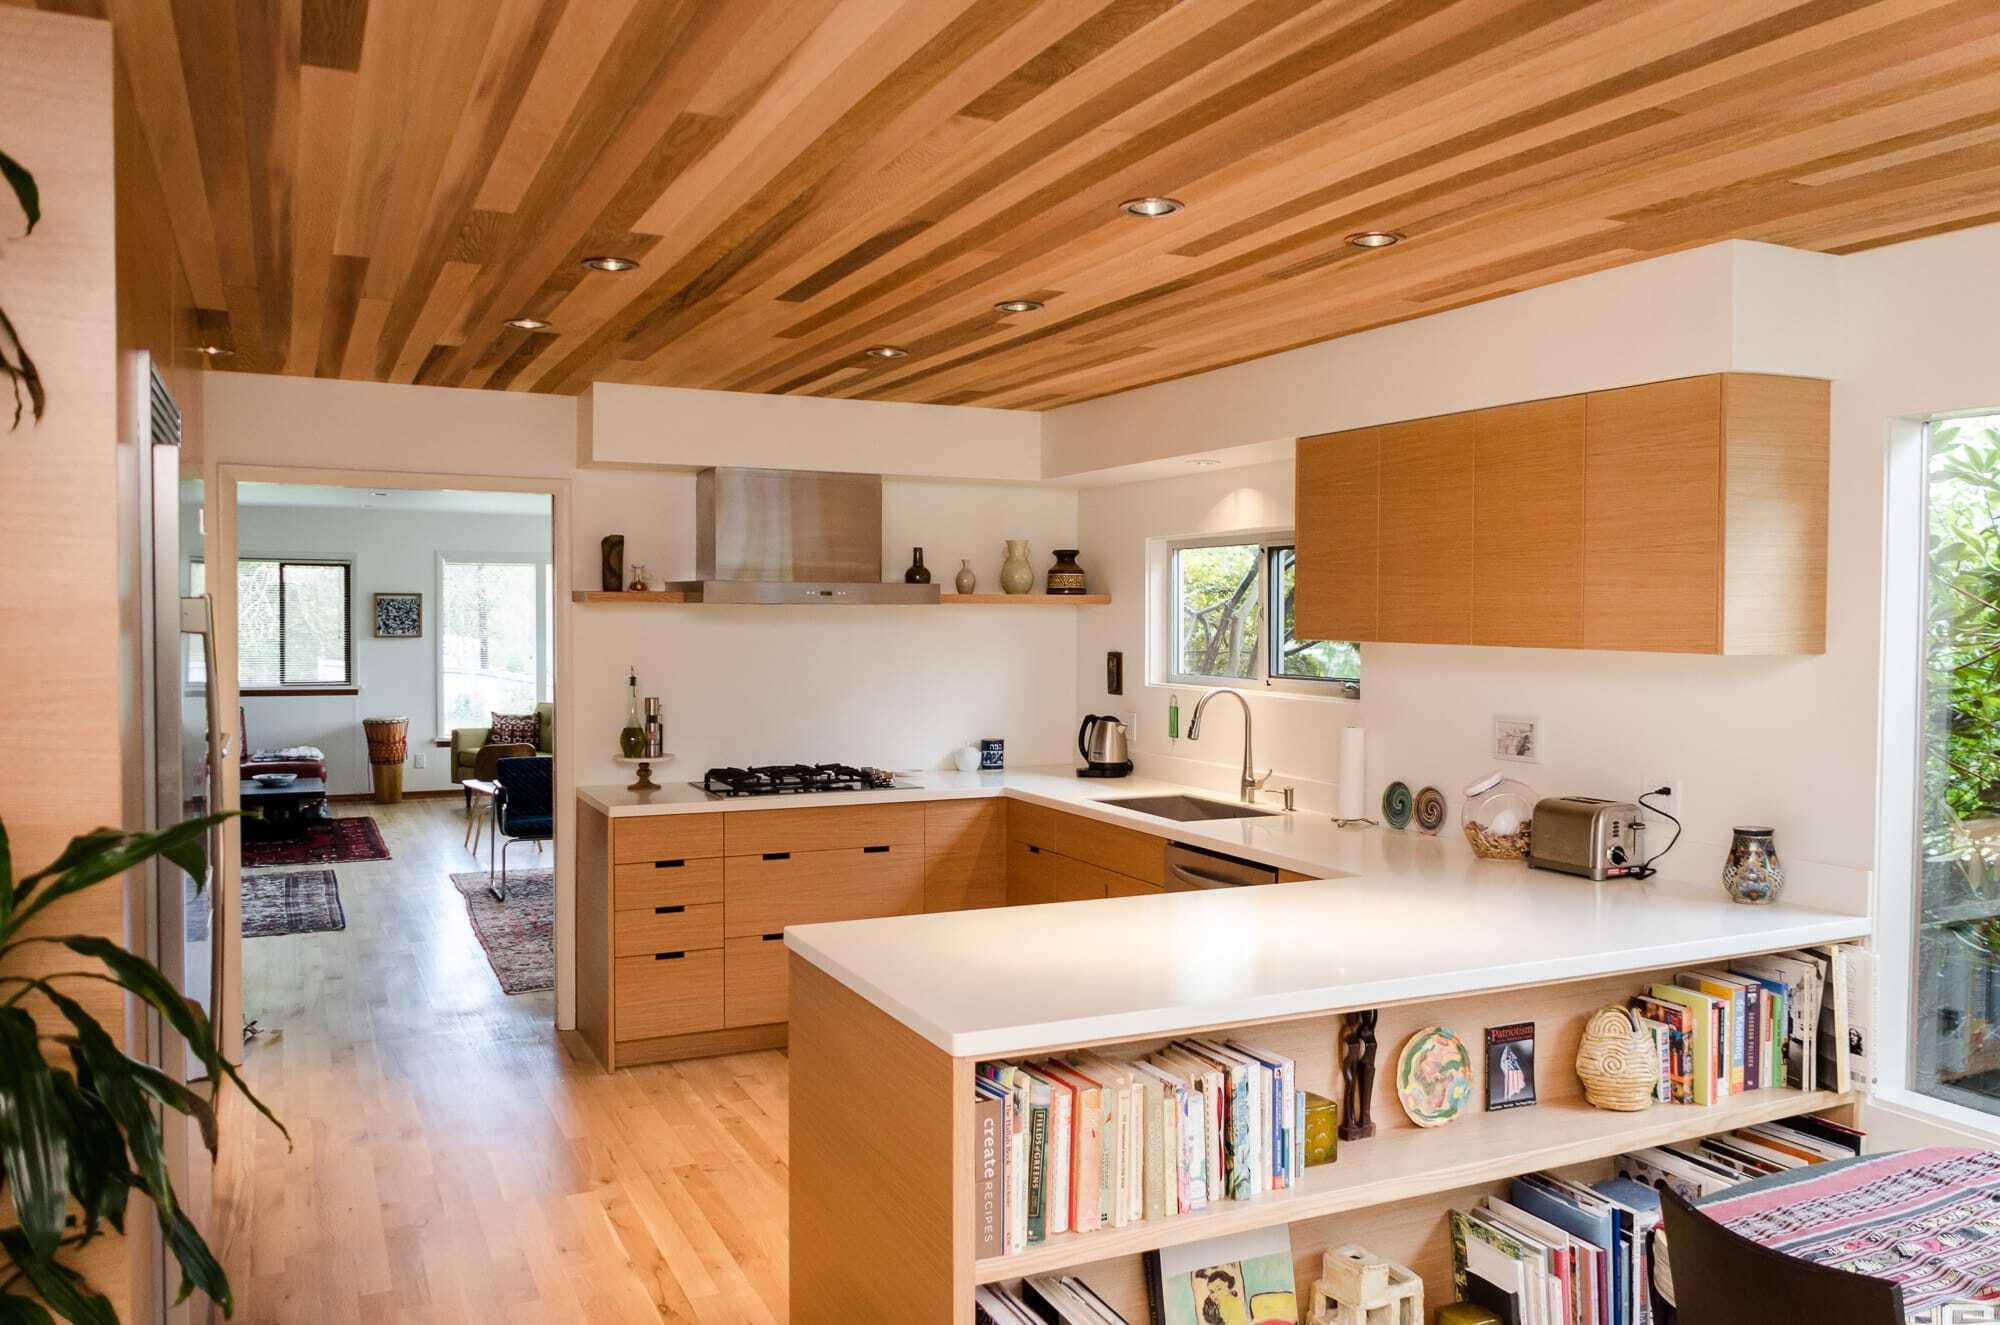 Toddler Bed Rail For Ikea Crib ~ Custom IKEA Kitchen, Bainbridge Island  NW homeworks